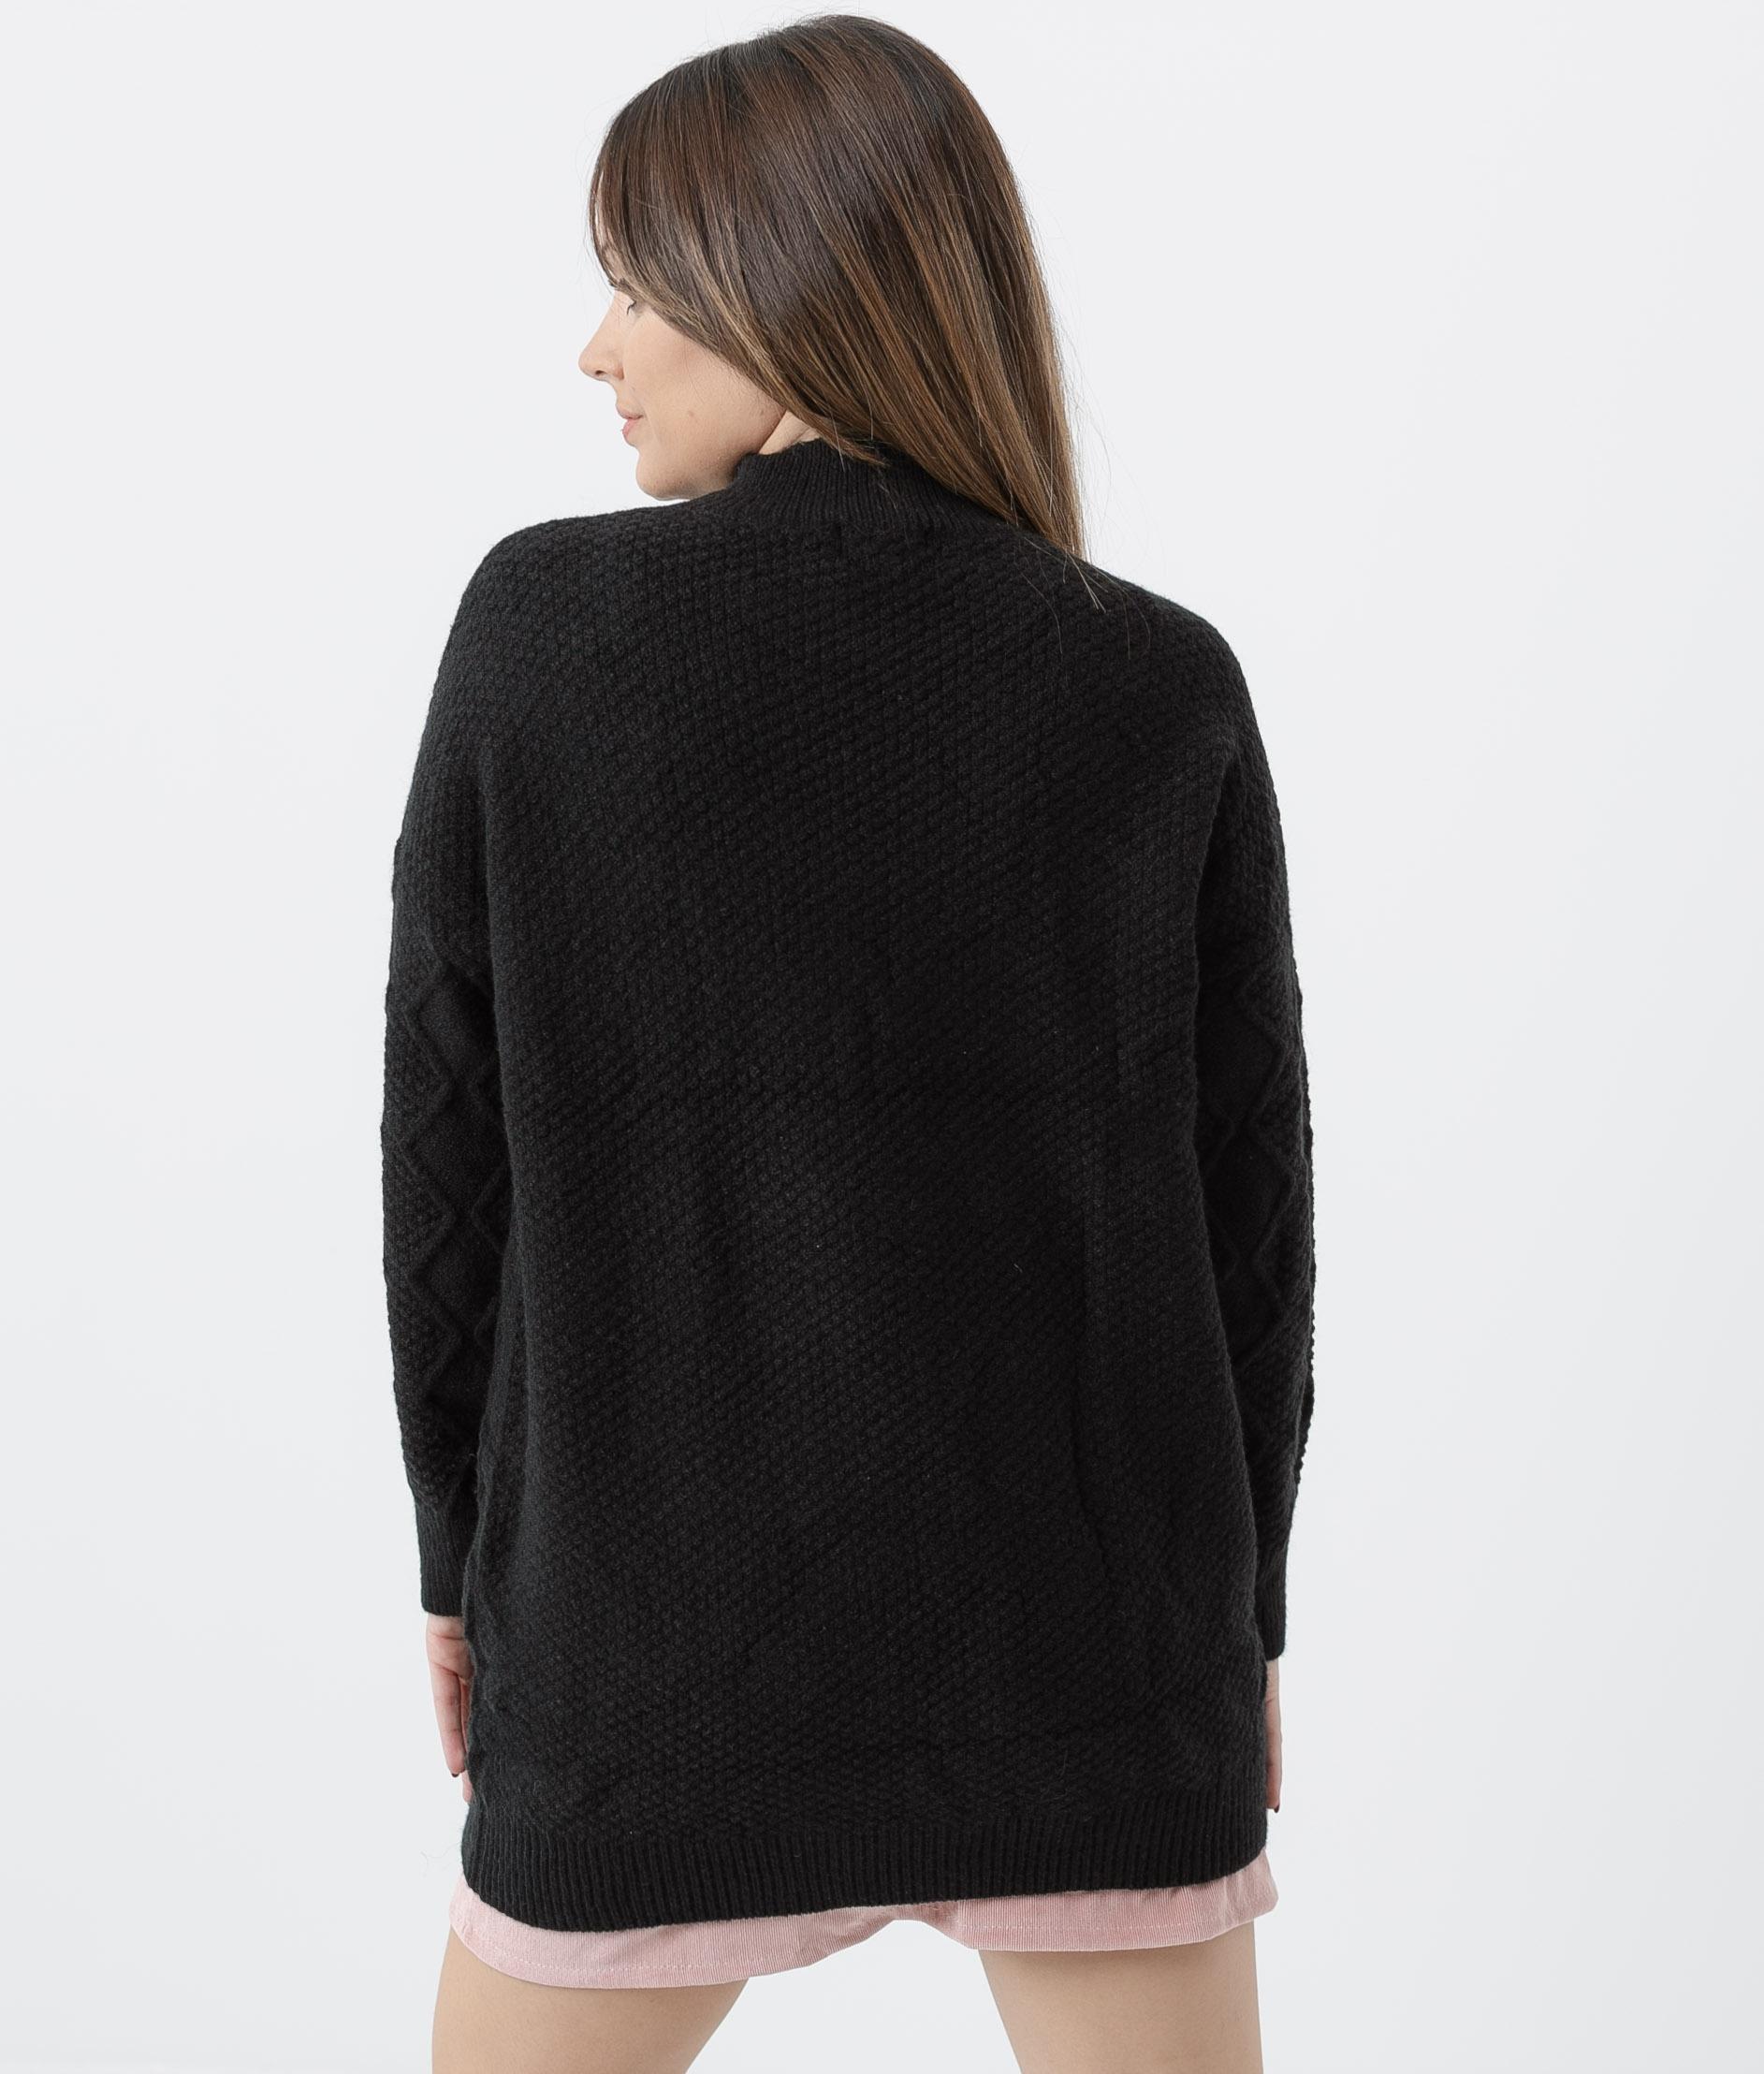 SWEATER MACONDO - BLACK